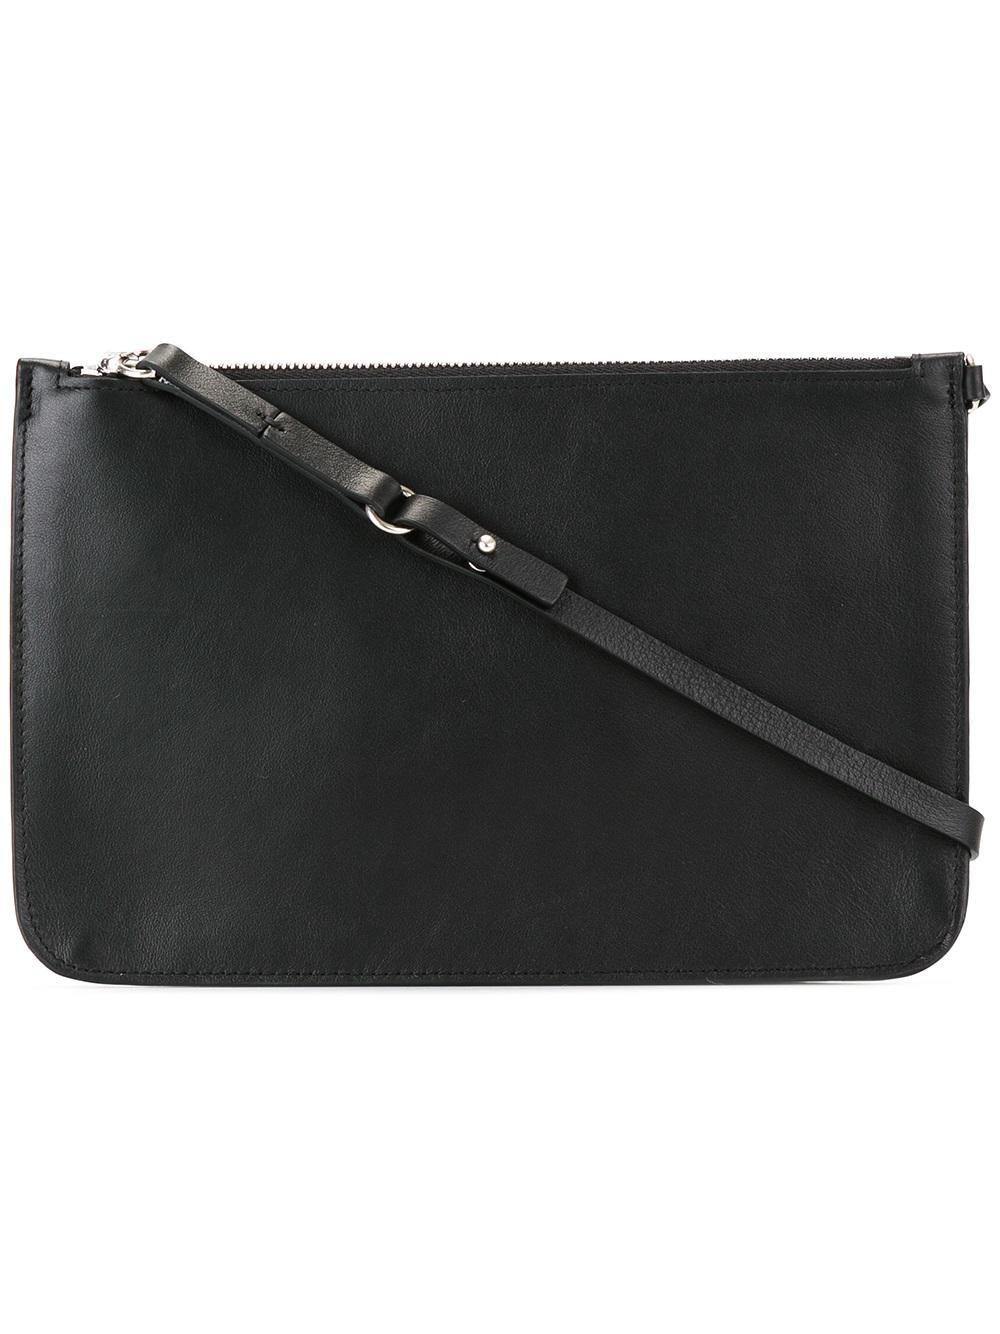 Lyst Maison Margiela Top Handle Clutch Bag In Black